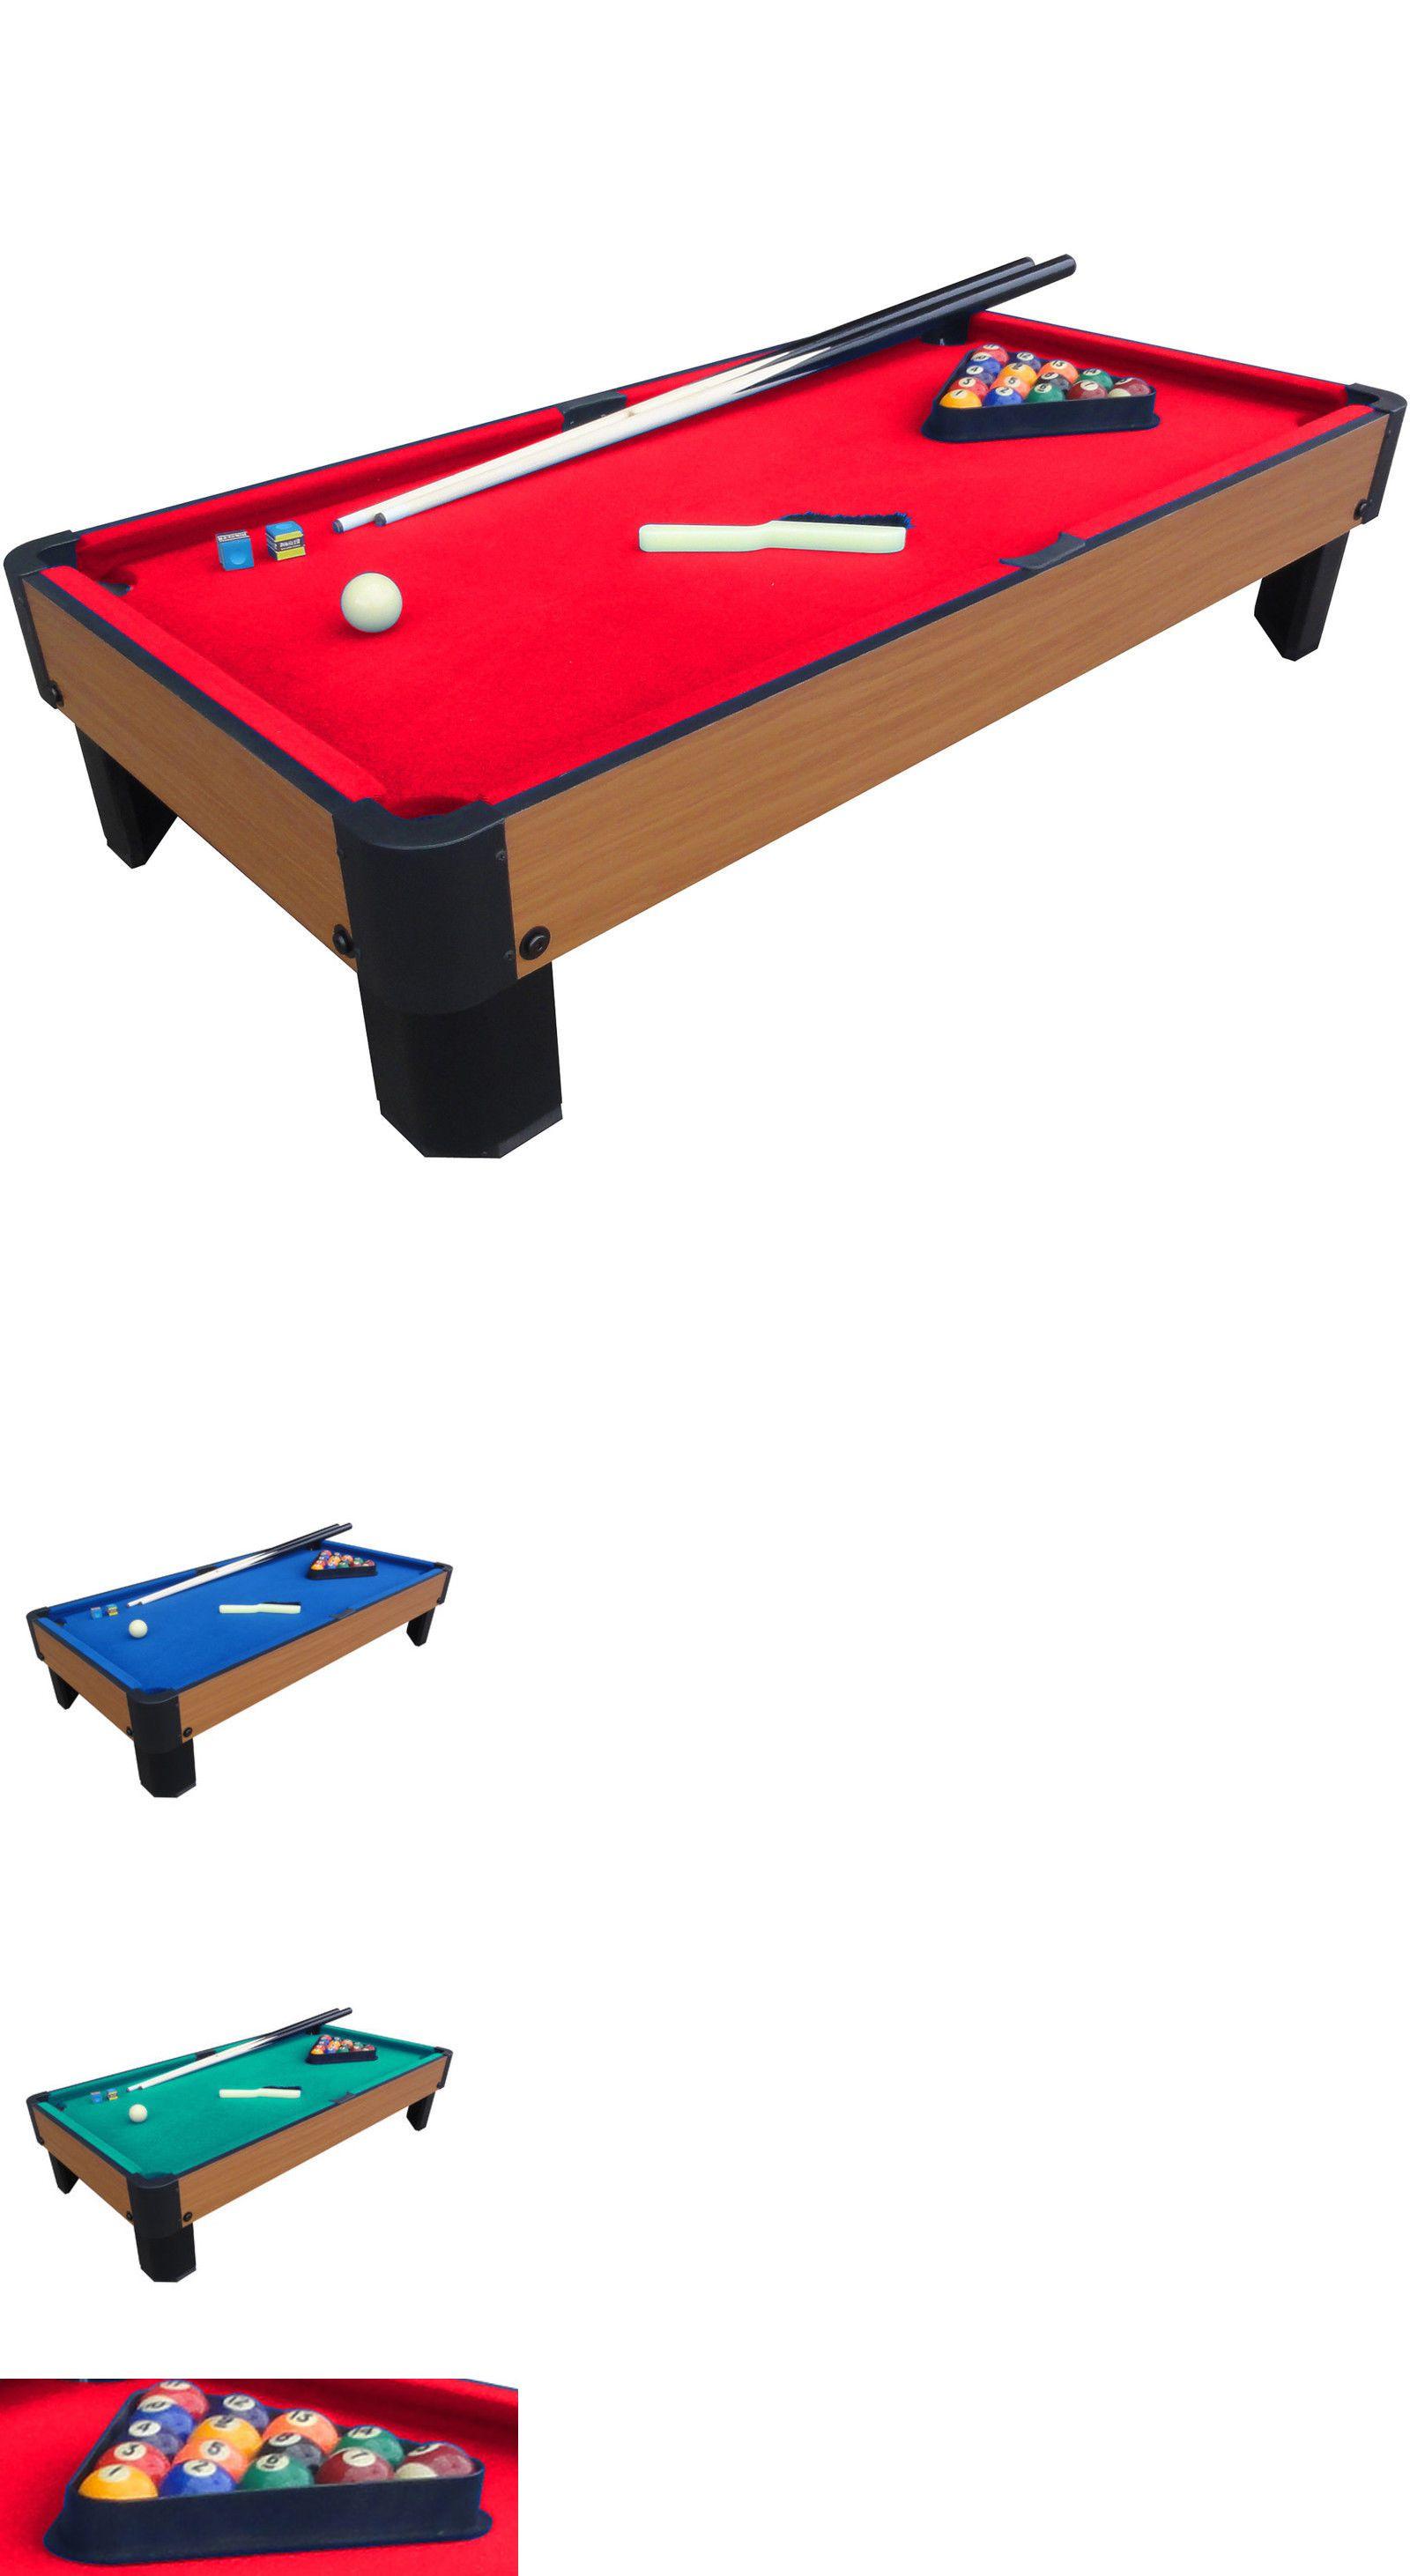 Tables 21213: Playcraft Sport Bank Shot 40 Mini Pool Billiard Table Top Red  Cloth Cues